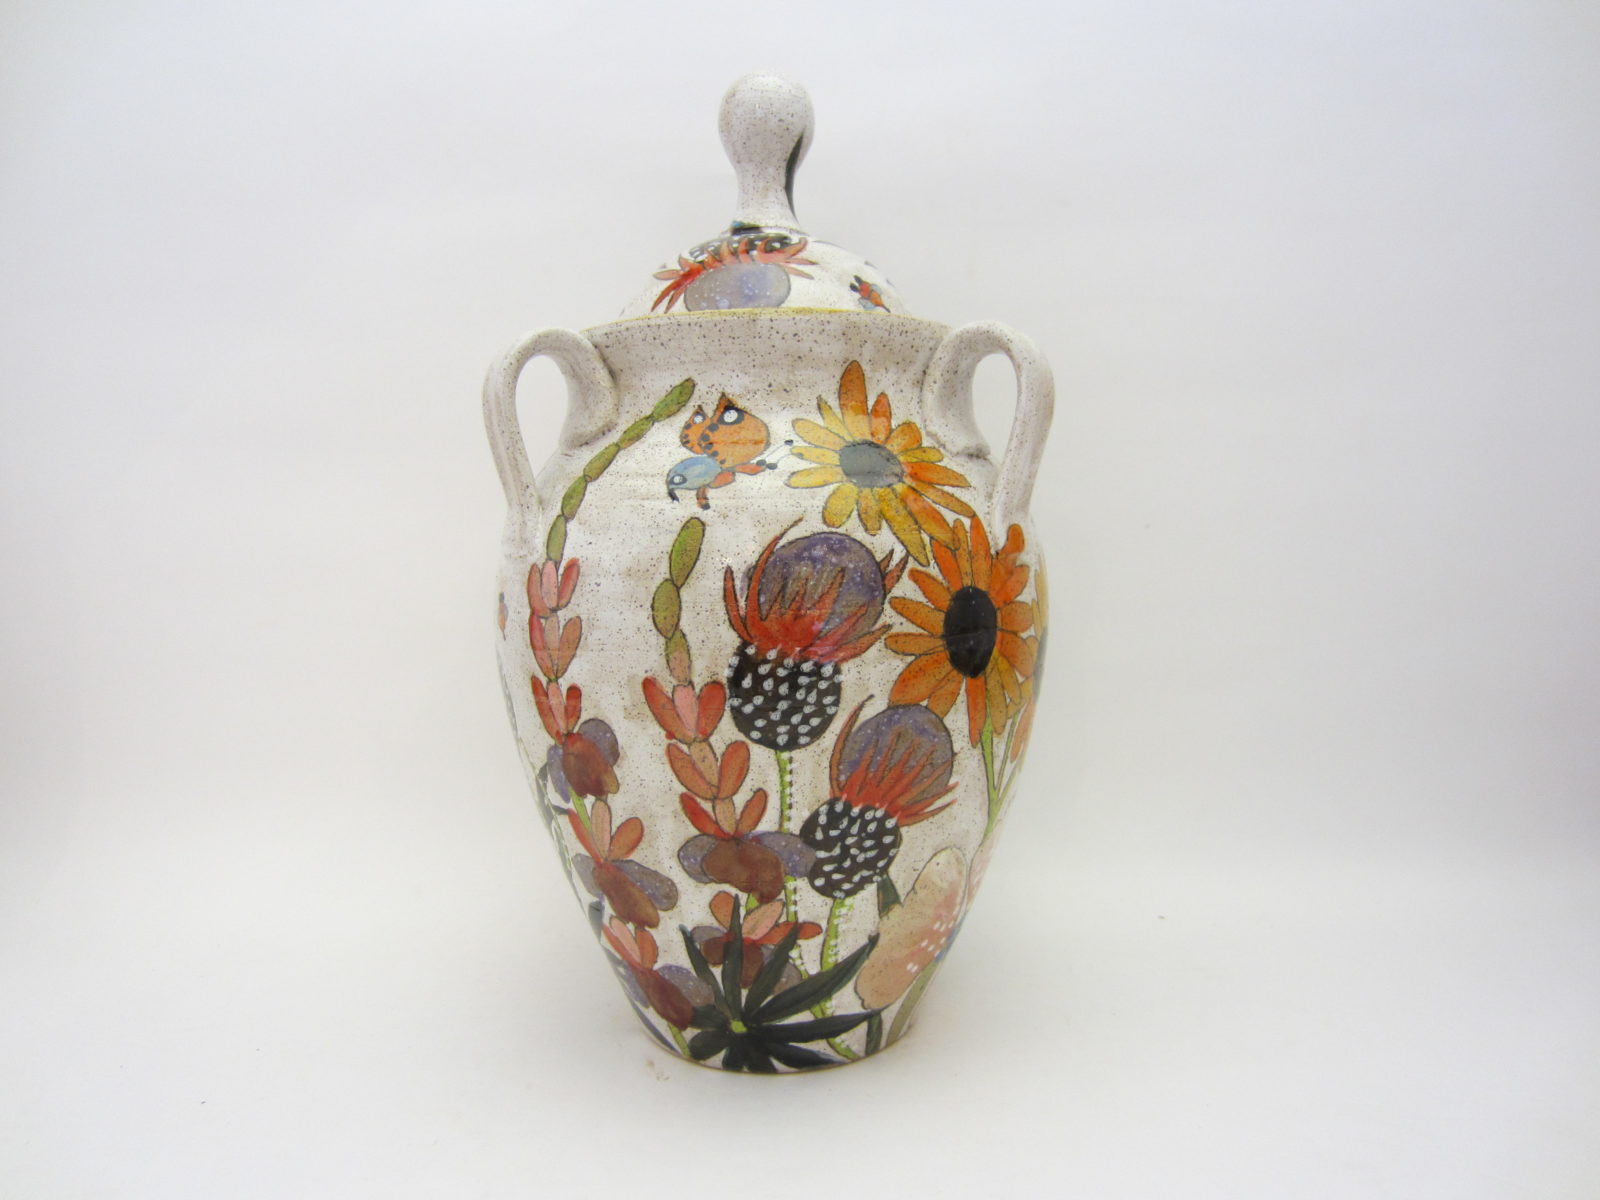 tall hammered metal vase of https risdcraft com cropped risd craft header1 copy 2017 02 21t20 inside dwo wen chen 255948 1057428